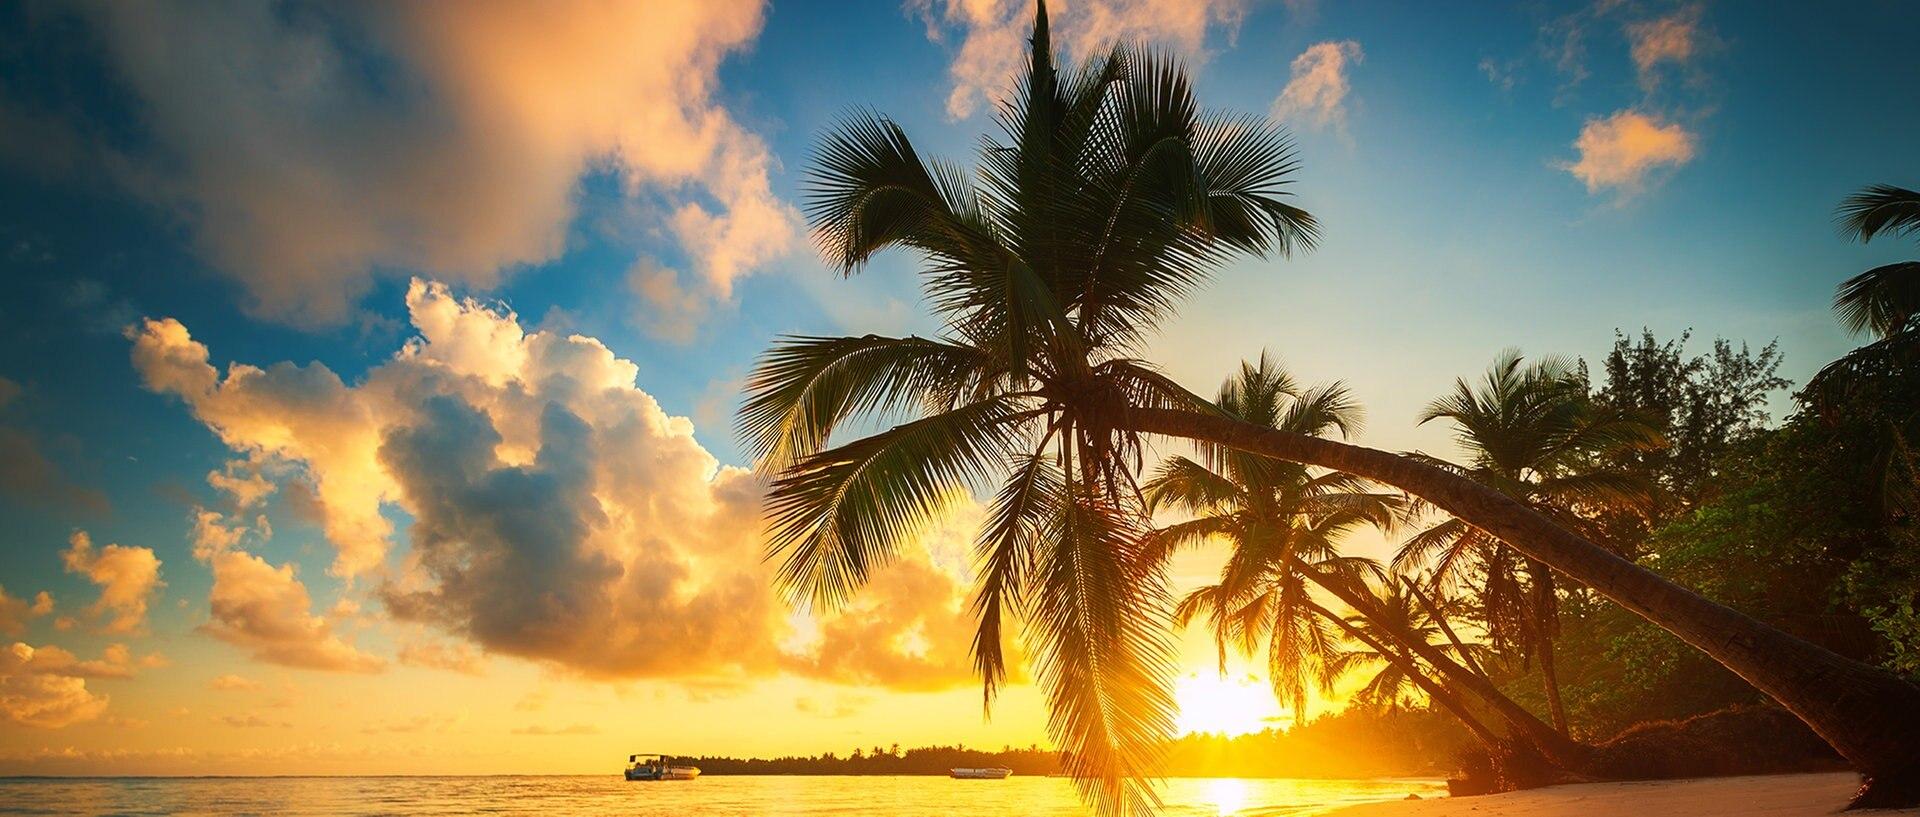 Sonnenuntergang am Palmenstrand., © fotoliaFotograf: ValentinValkov